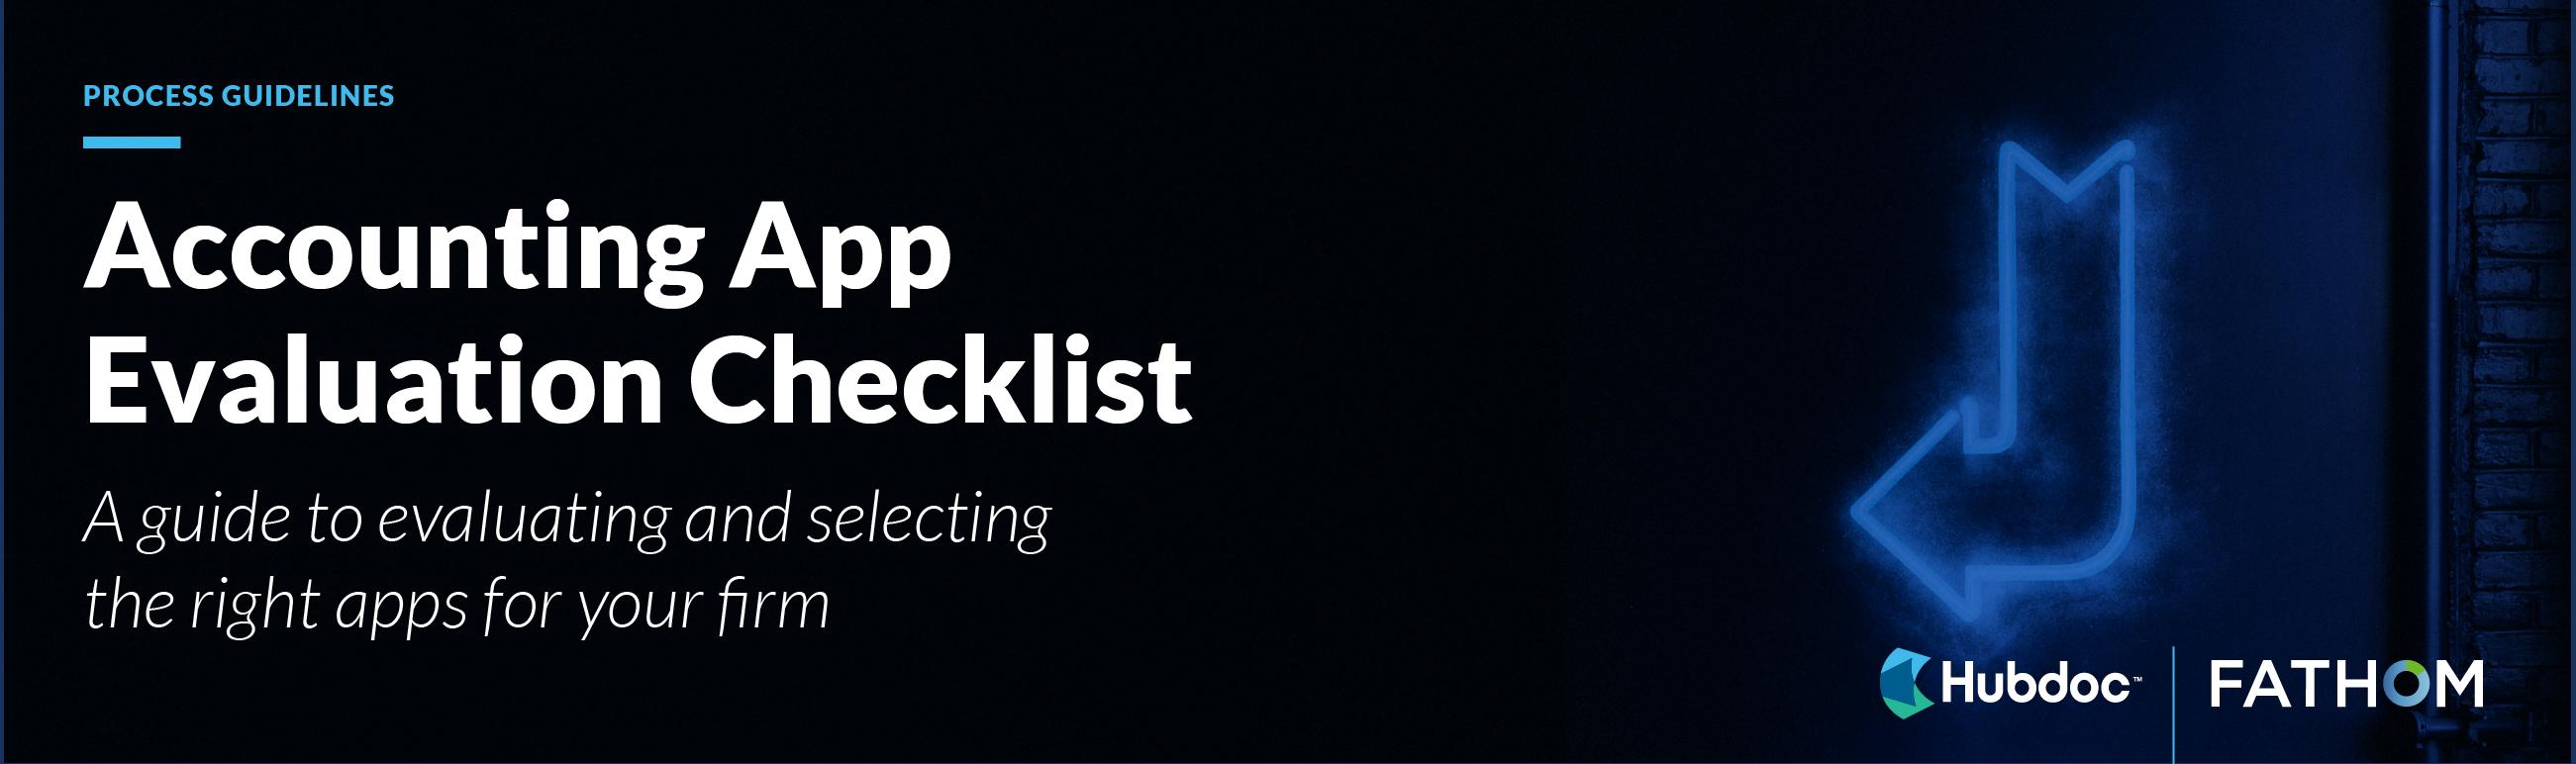 AccountingAppChecklist-Landing-1.png